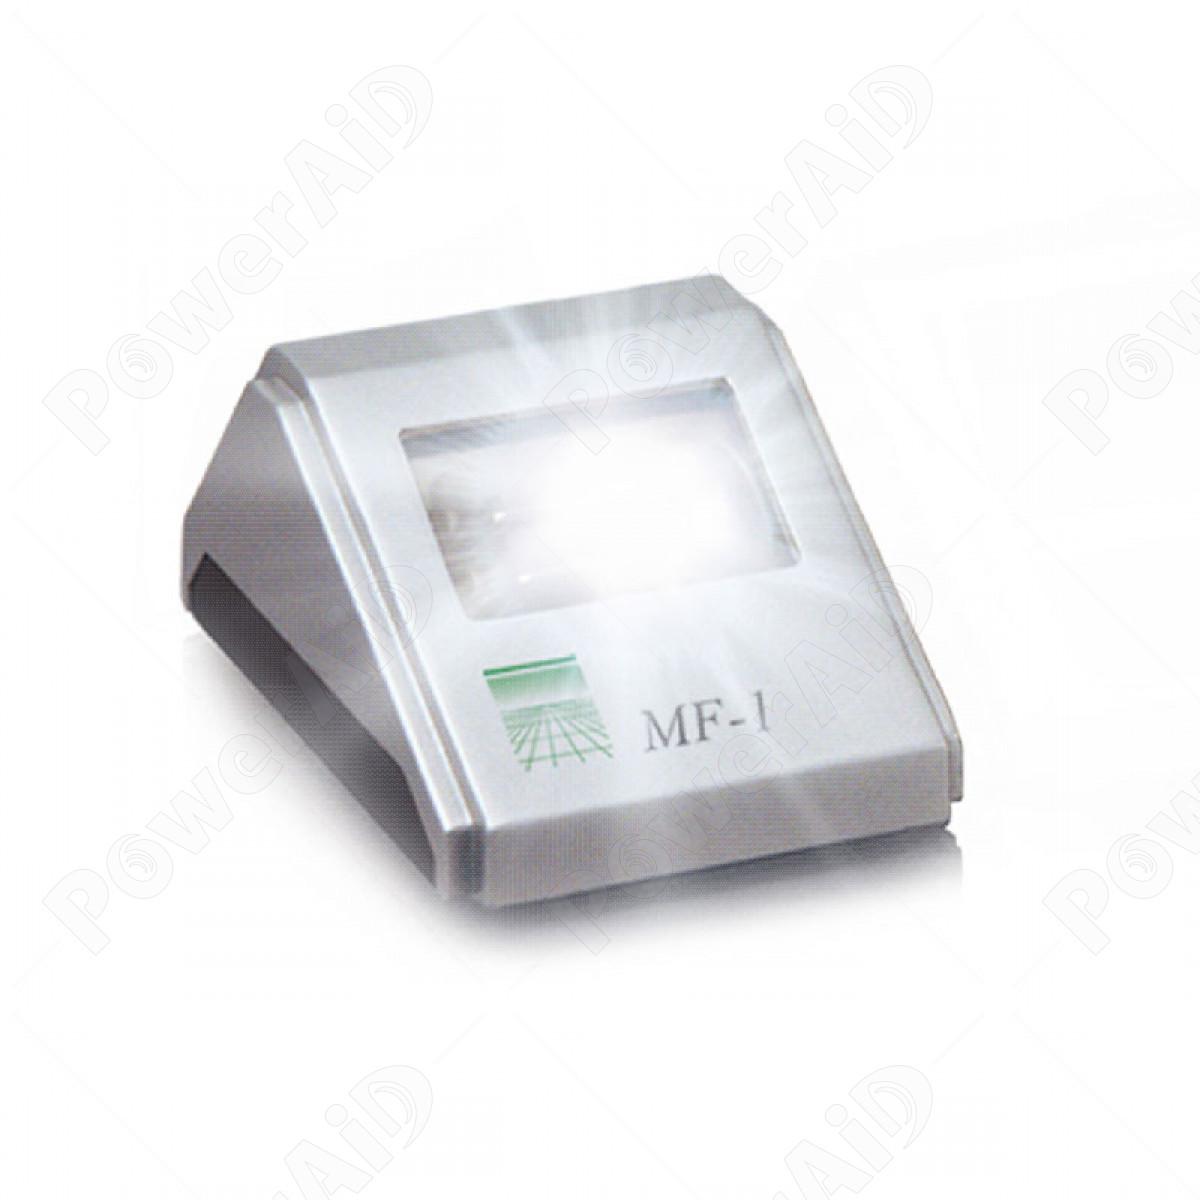 Humantechnik - Modulo Flash MF-1